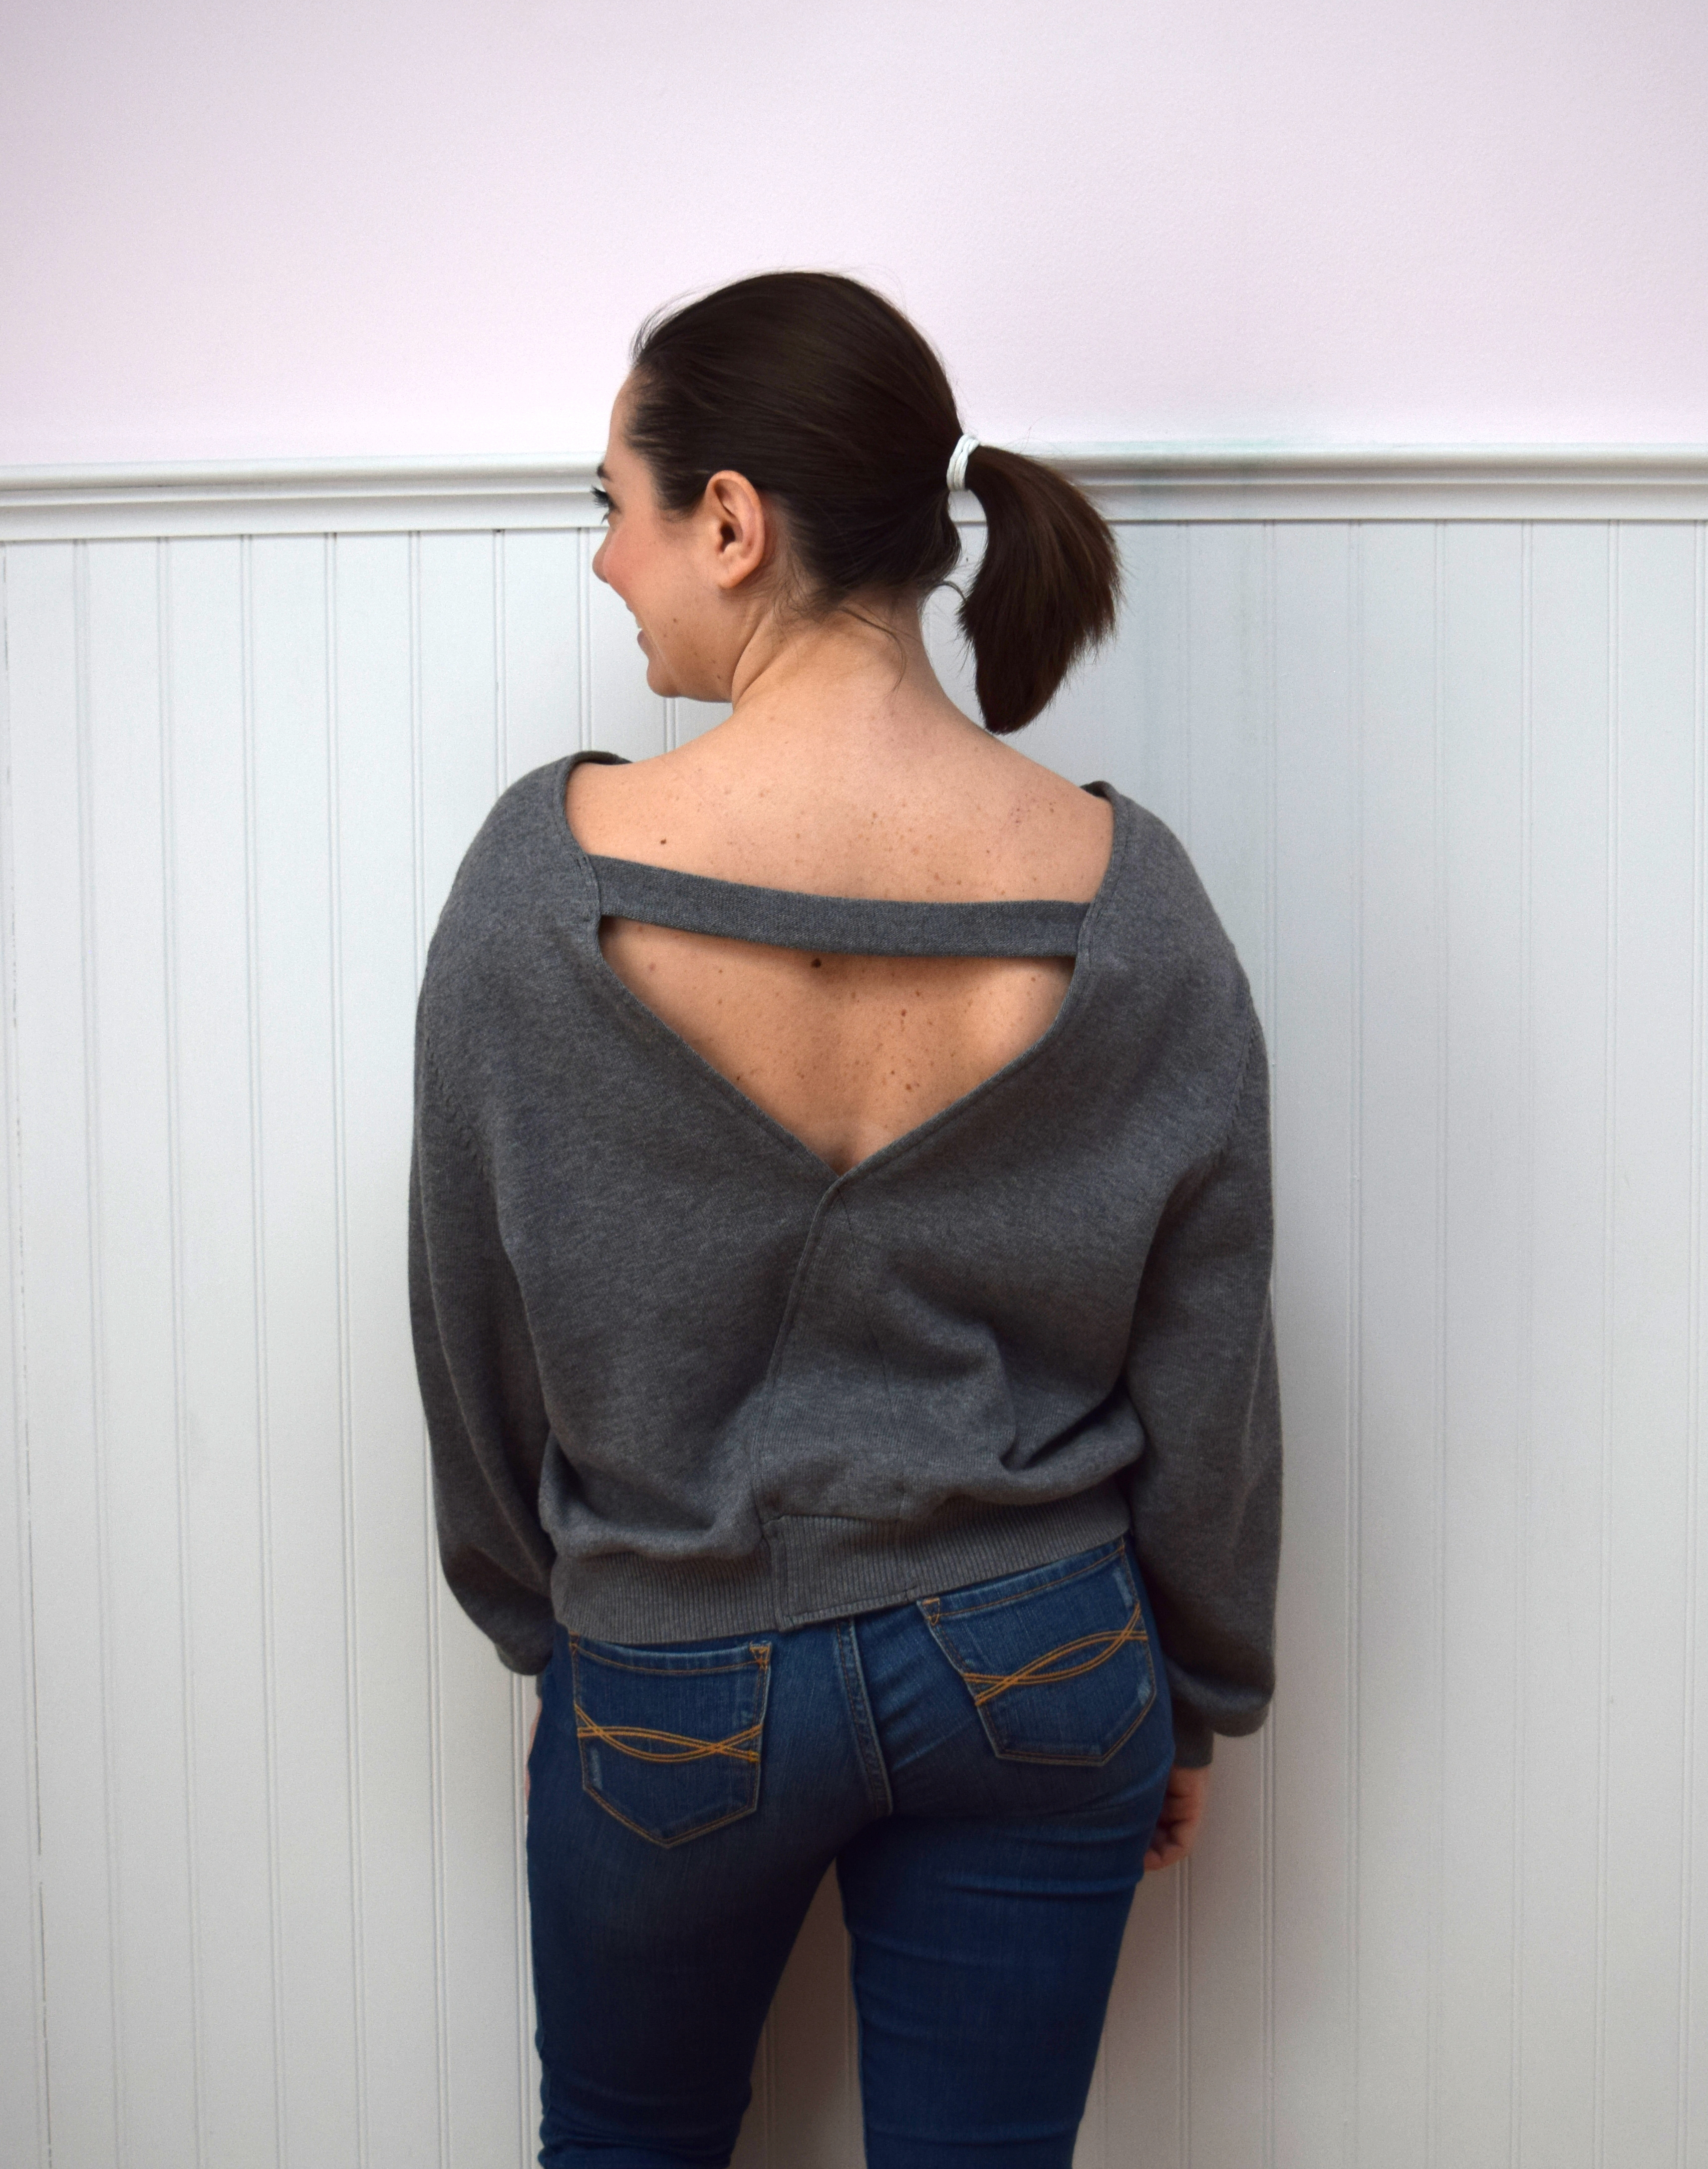 #RefashionFriday Cardigan to Open Back Sweater Refashion - Trish Stitched